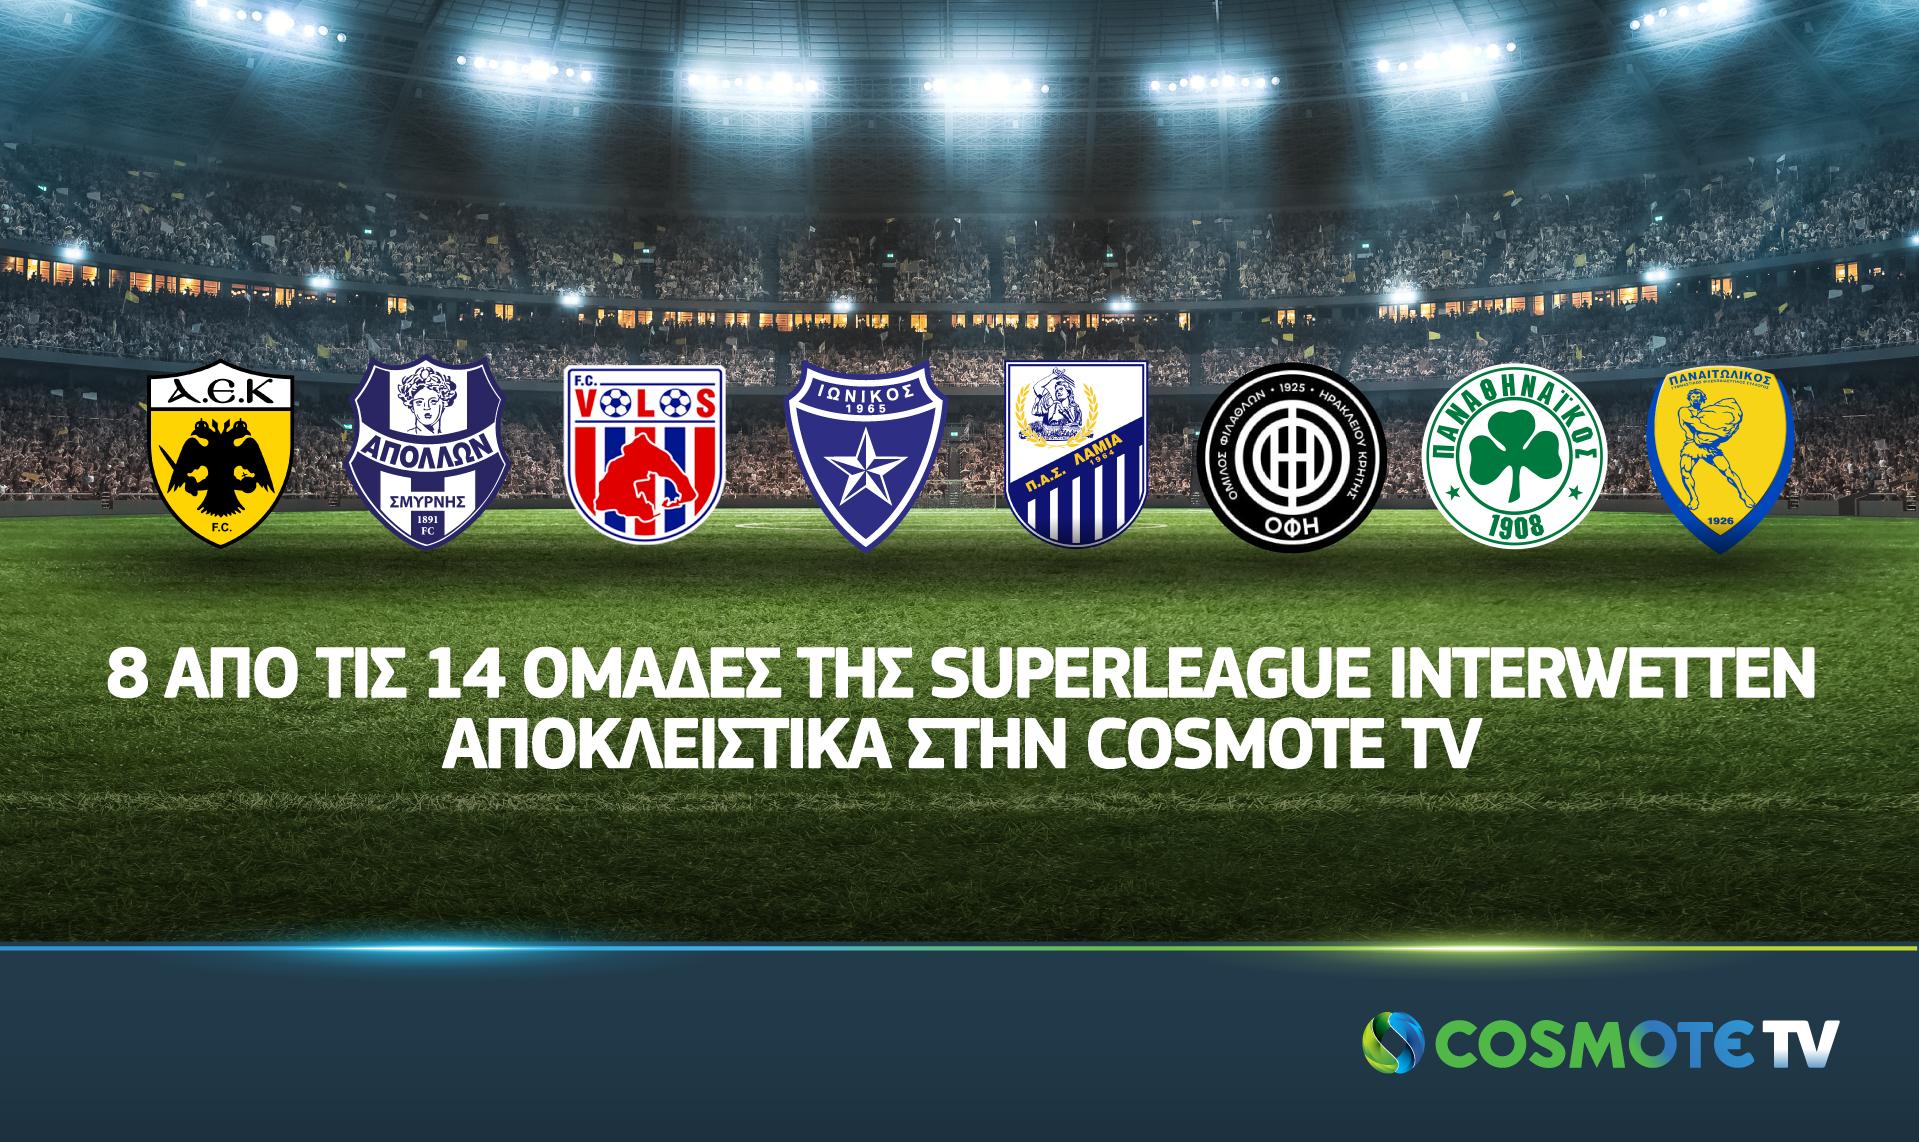 COSMOTETV Superleague Interwetten Exclusives